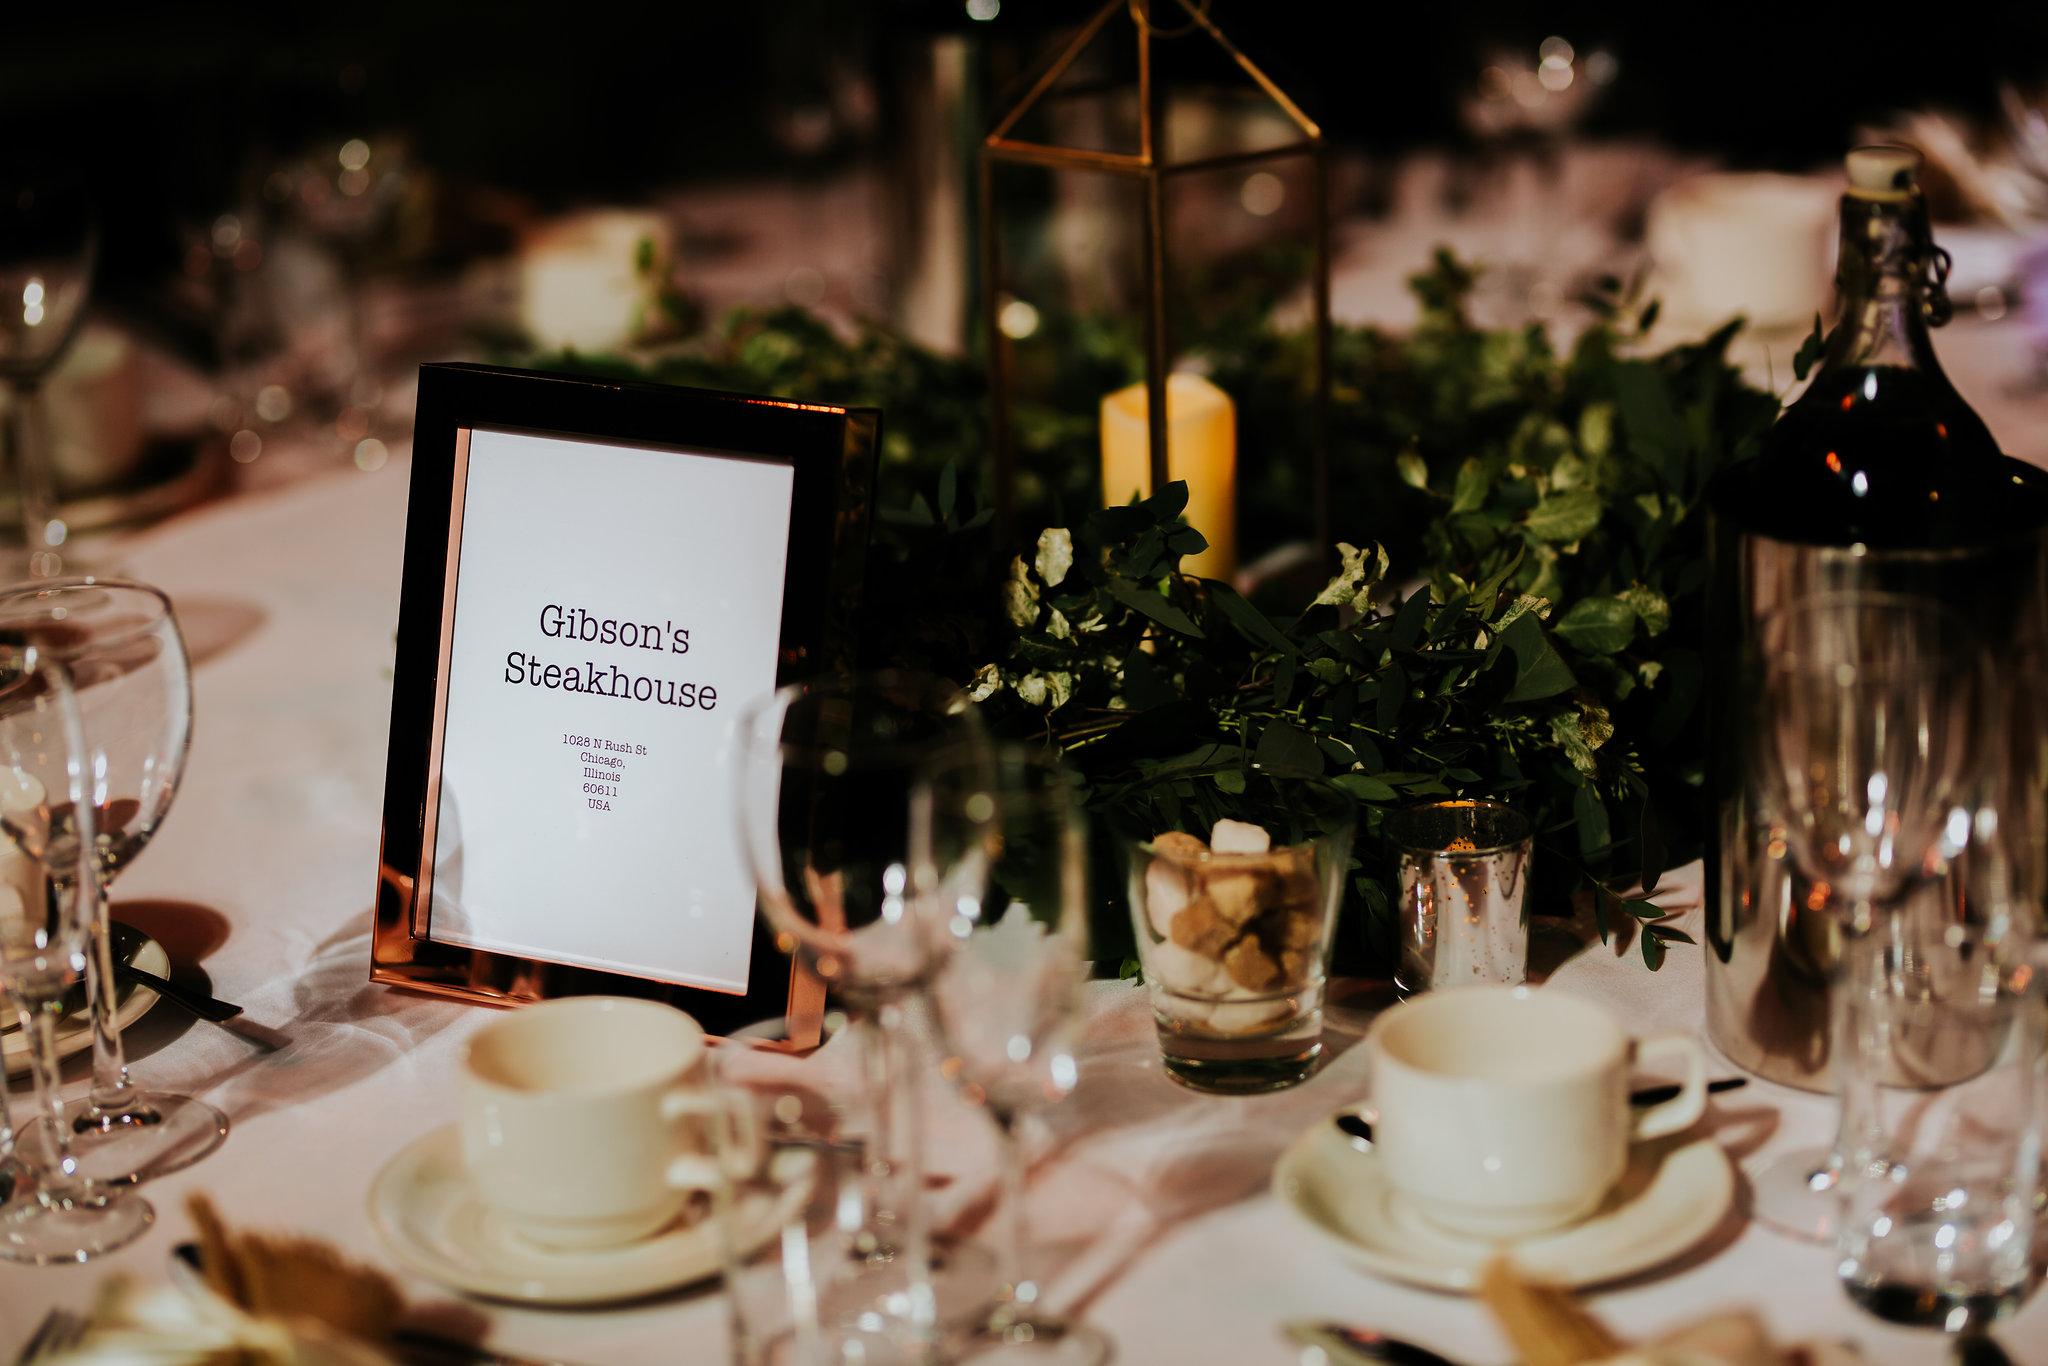 Cottiers wedding lavender and rose wedding florists scotland17.jpg